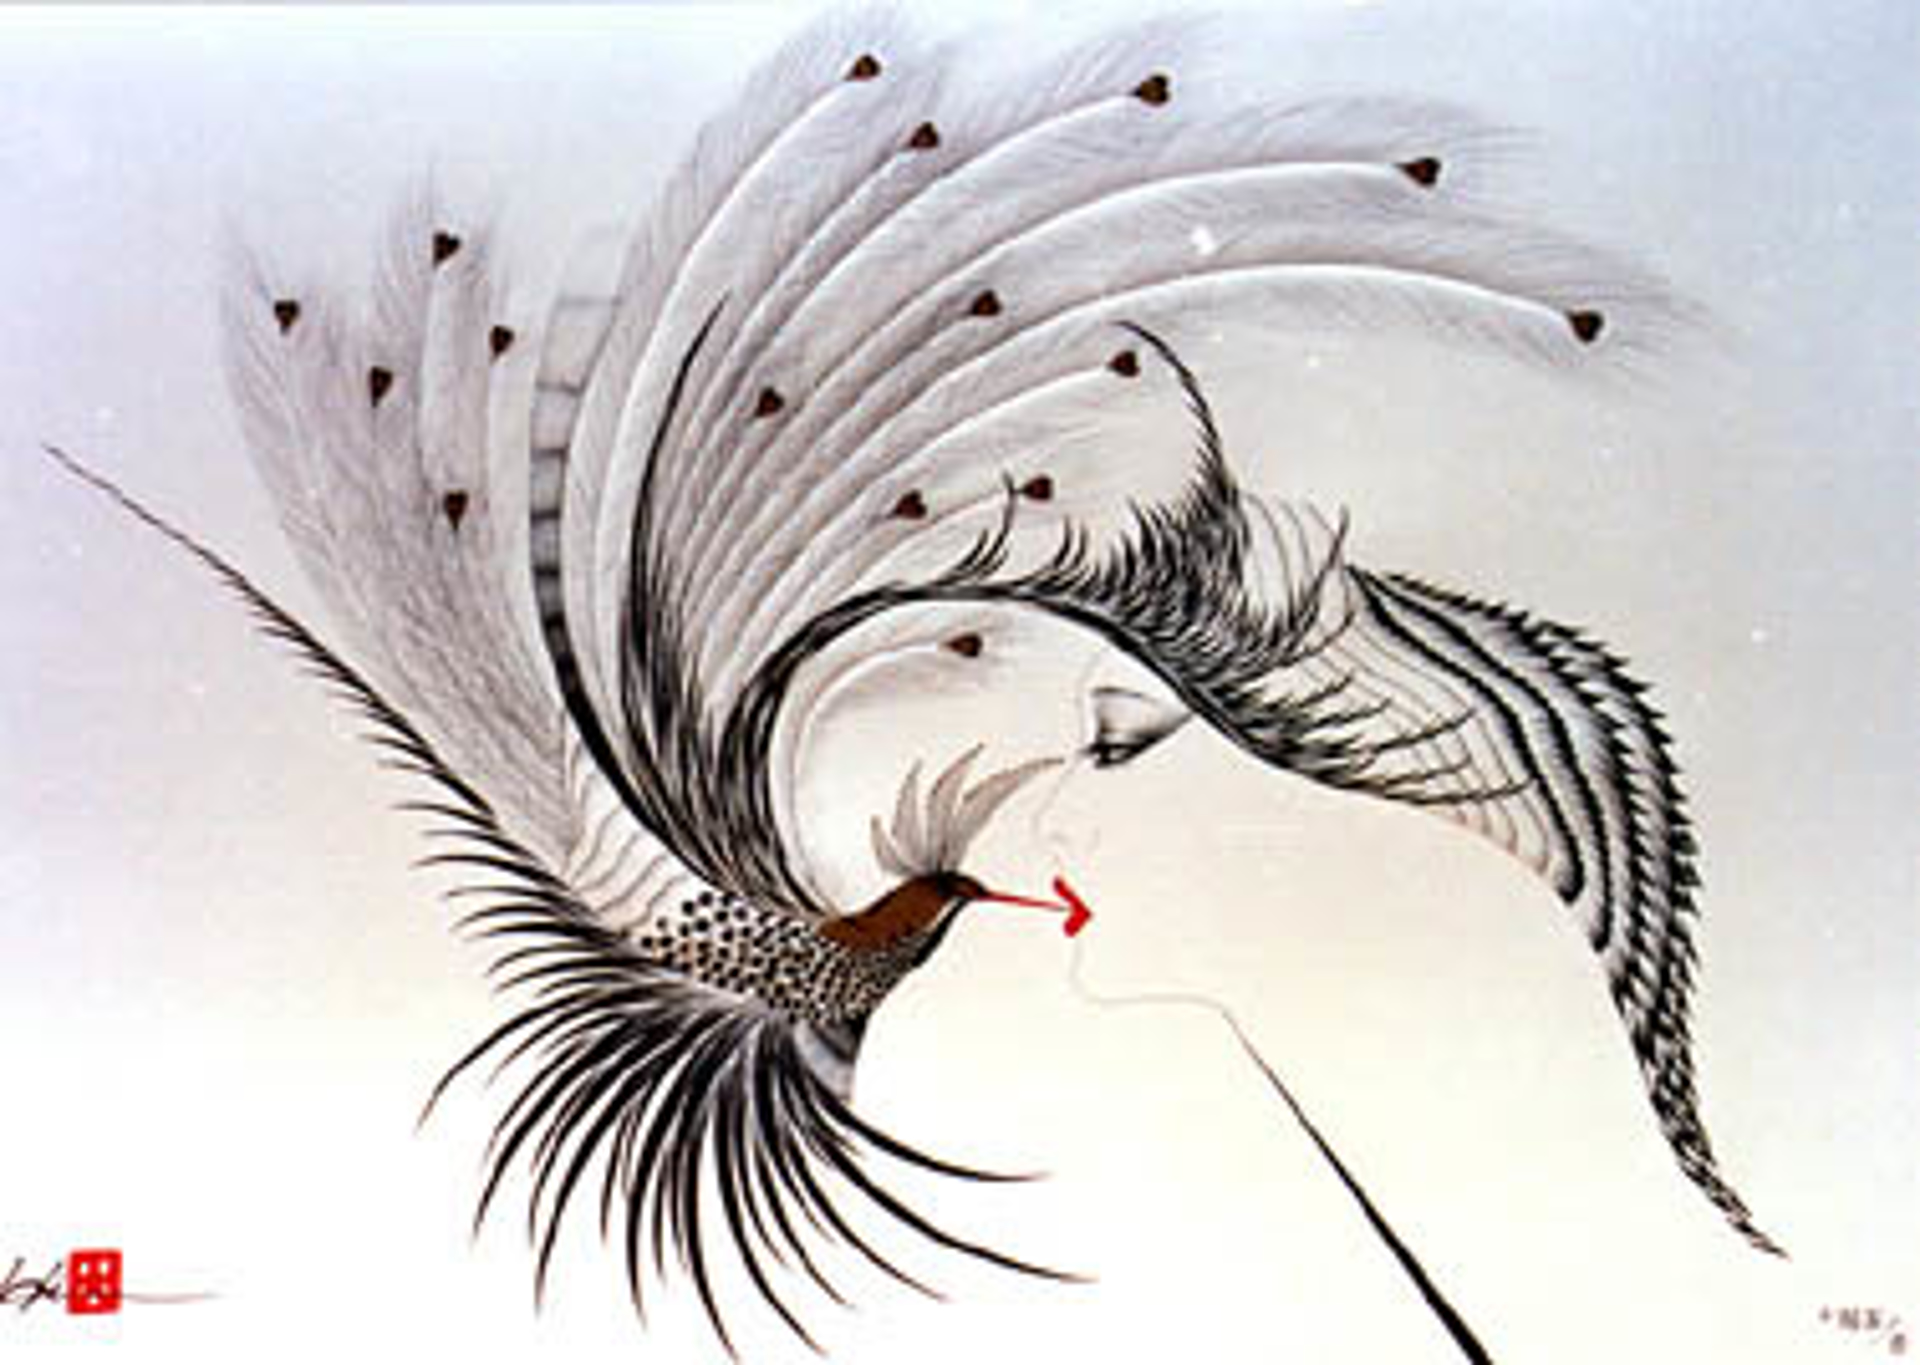 The Kiss by Hisashi Otsuka